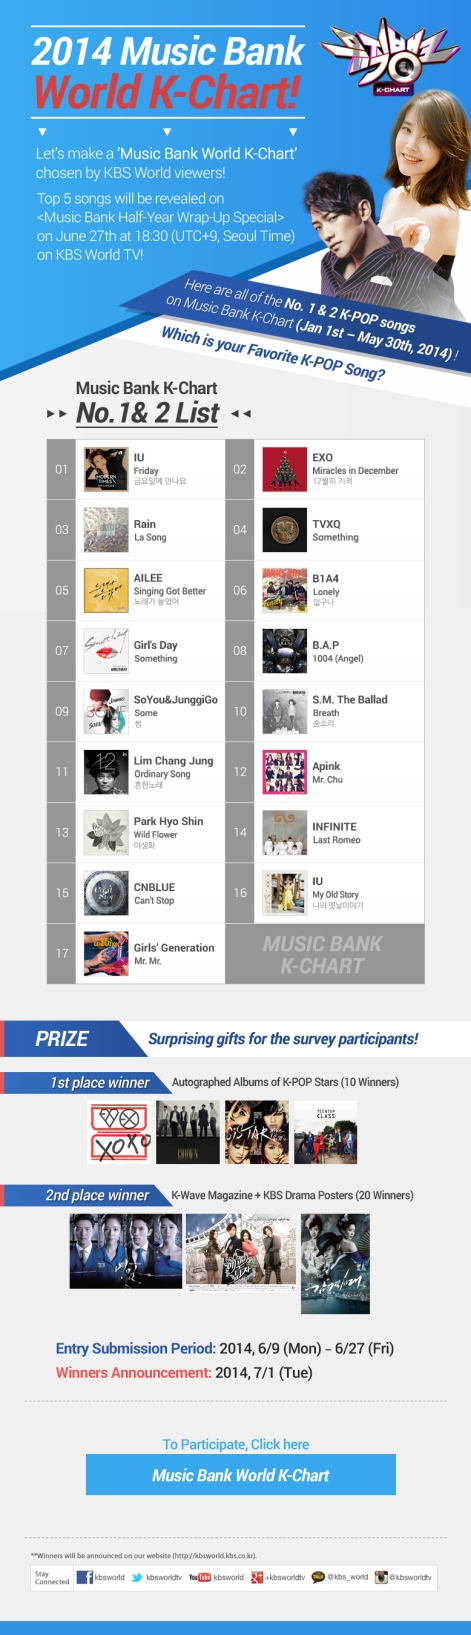 Music Bank K-chart_20140611(1) (1)(0)